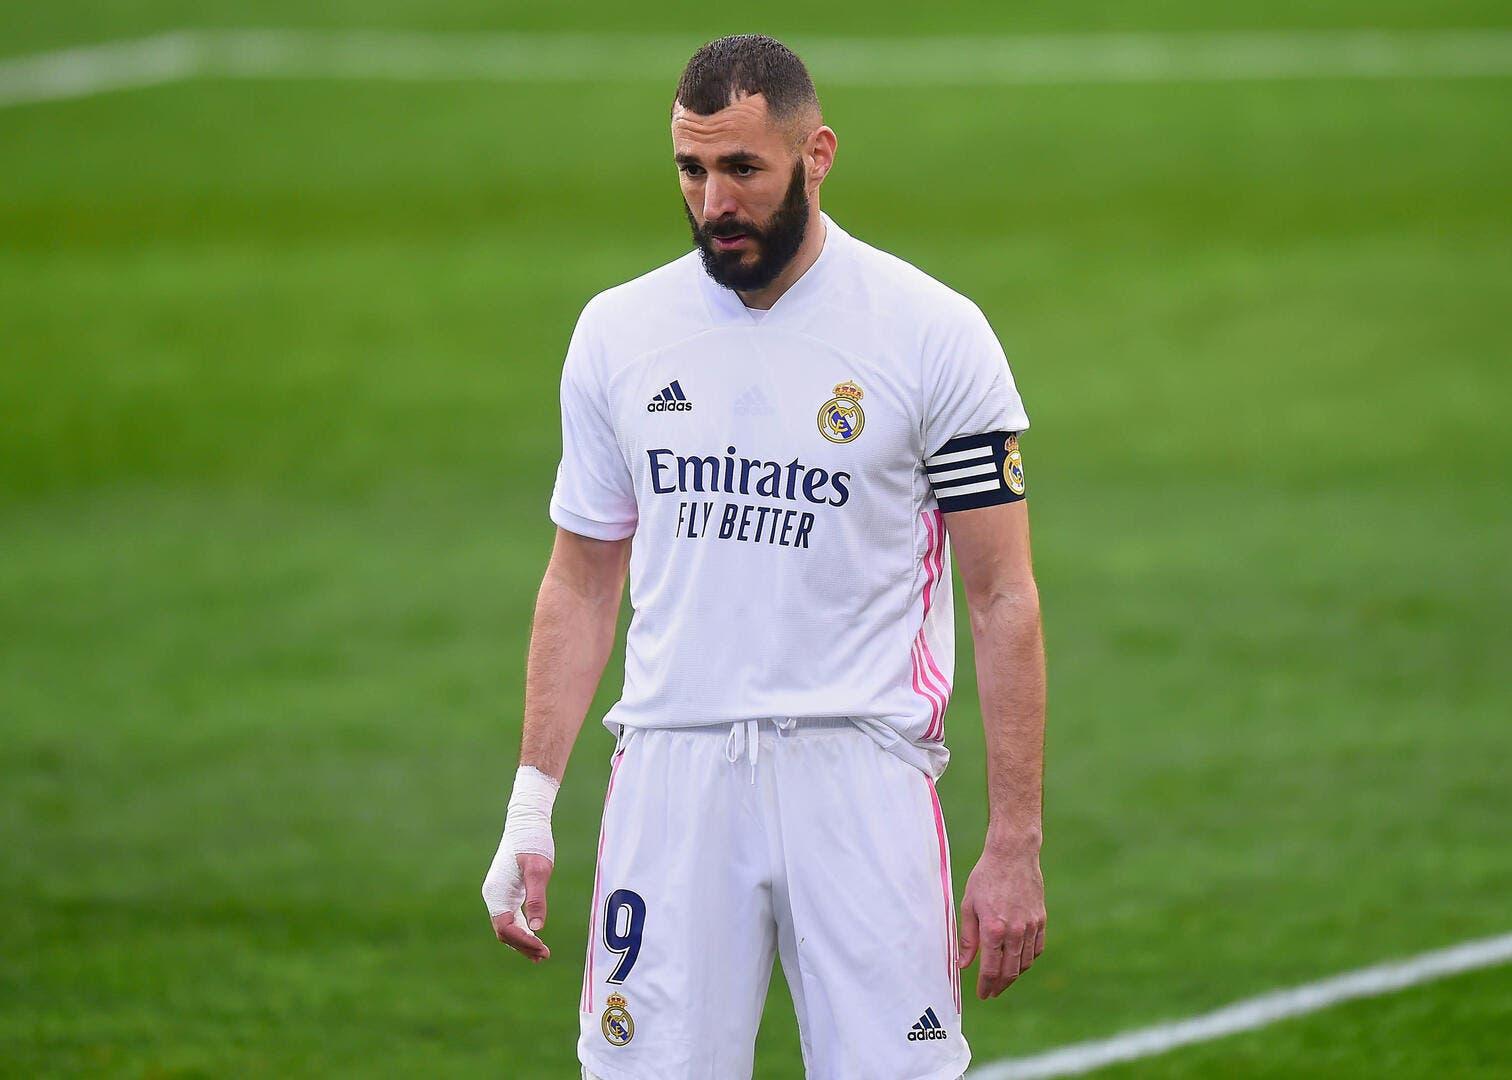 Esp : Benzema dépendance, alerte au Real Madrid - Foot01.com